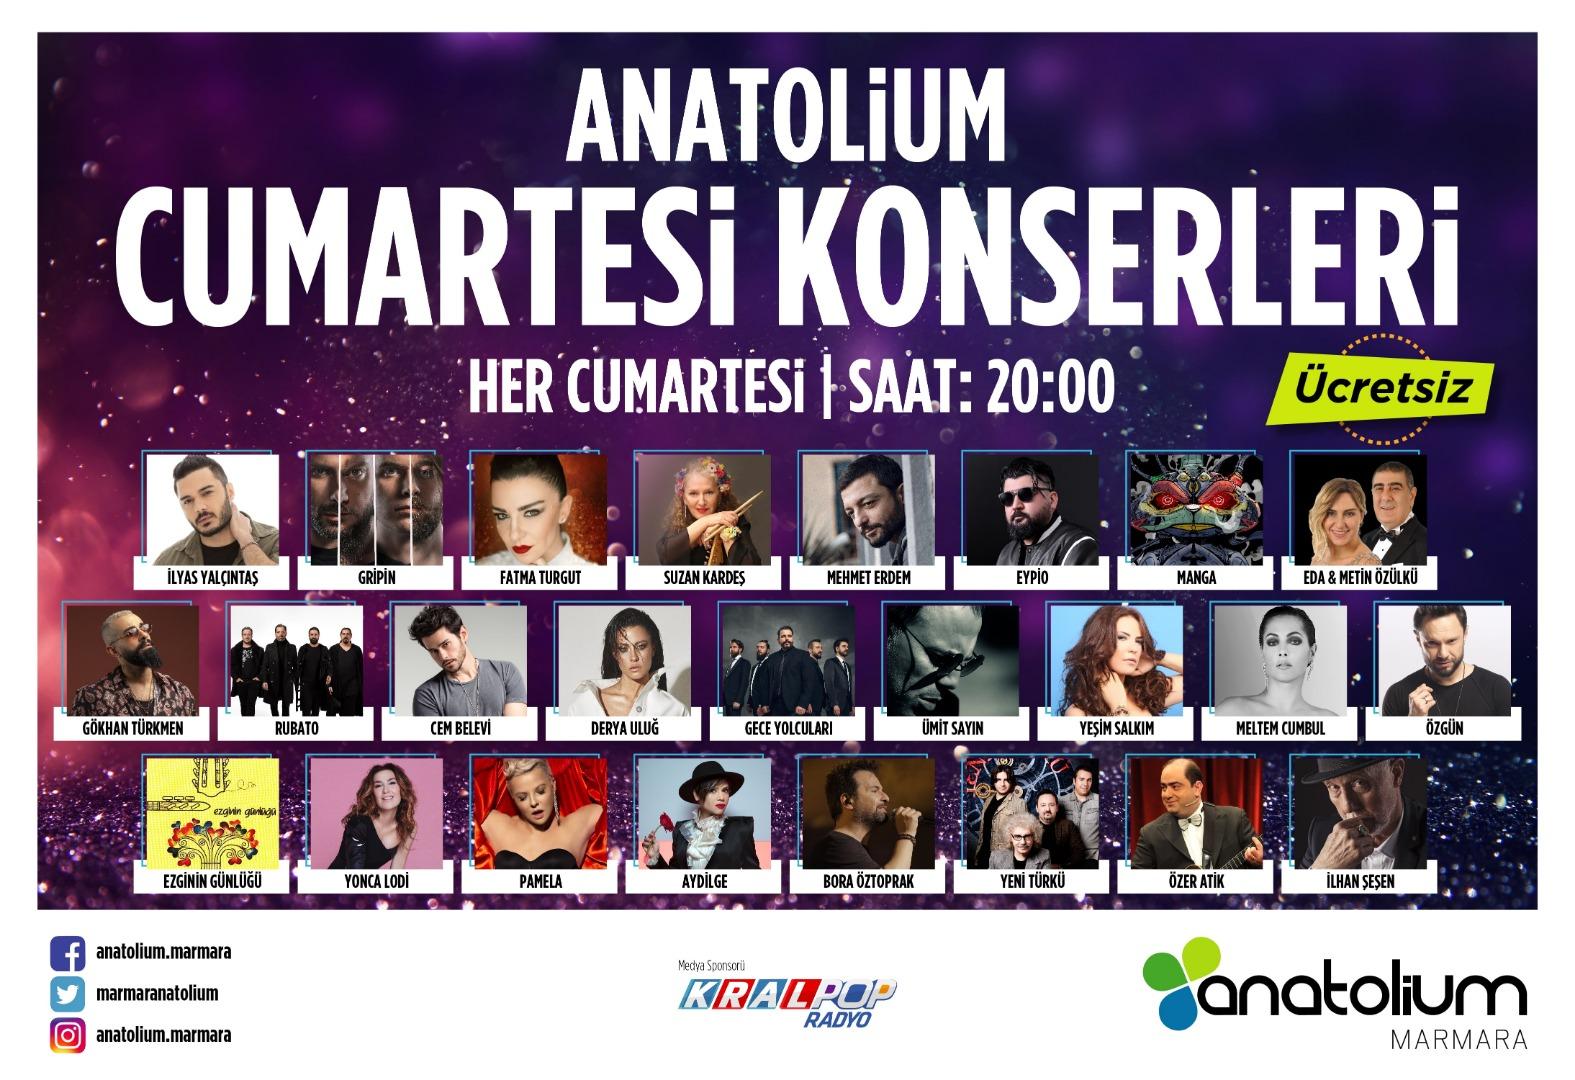 Anatolium Marmara İstanbul'u müziğe doyuracak